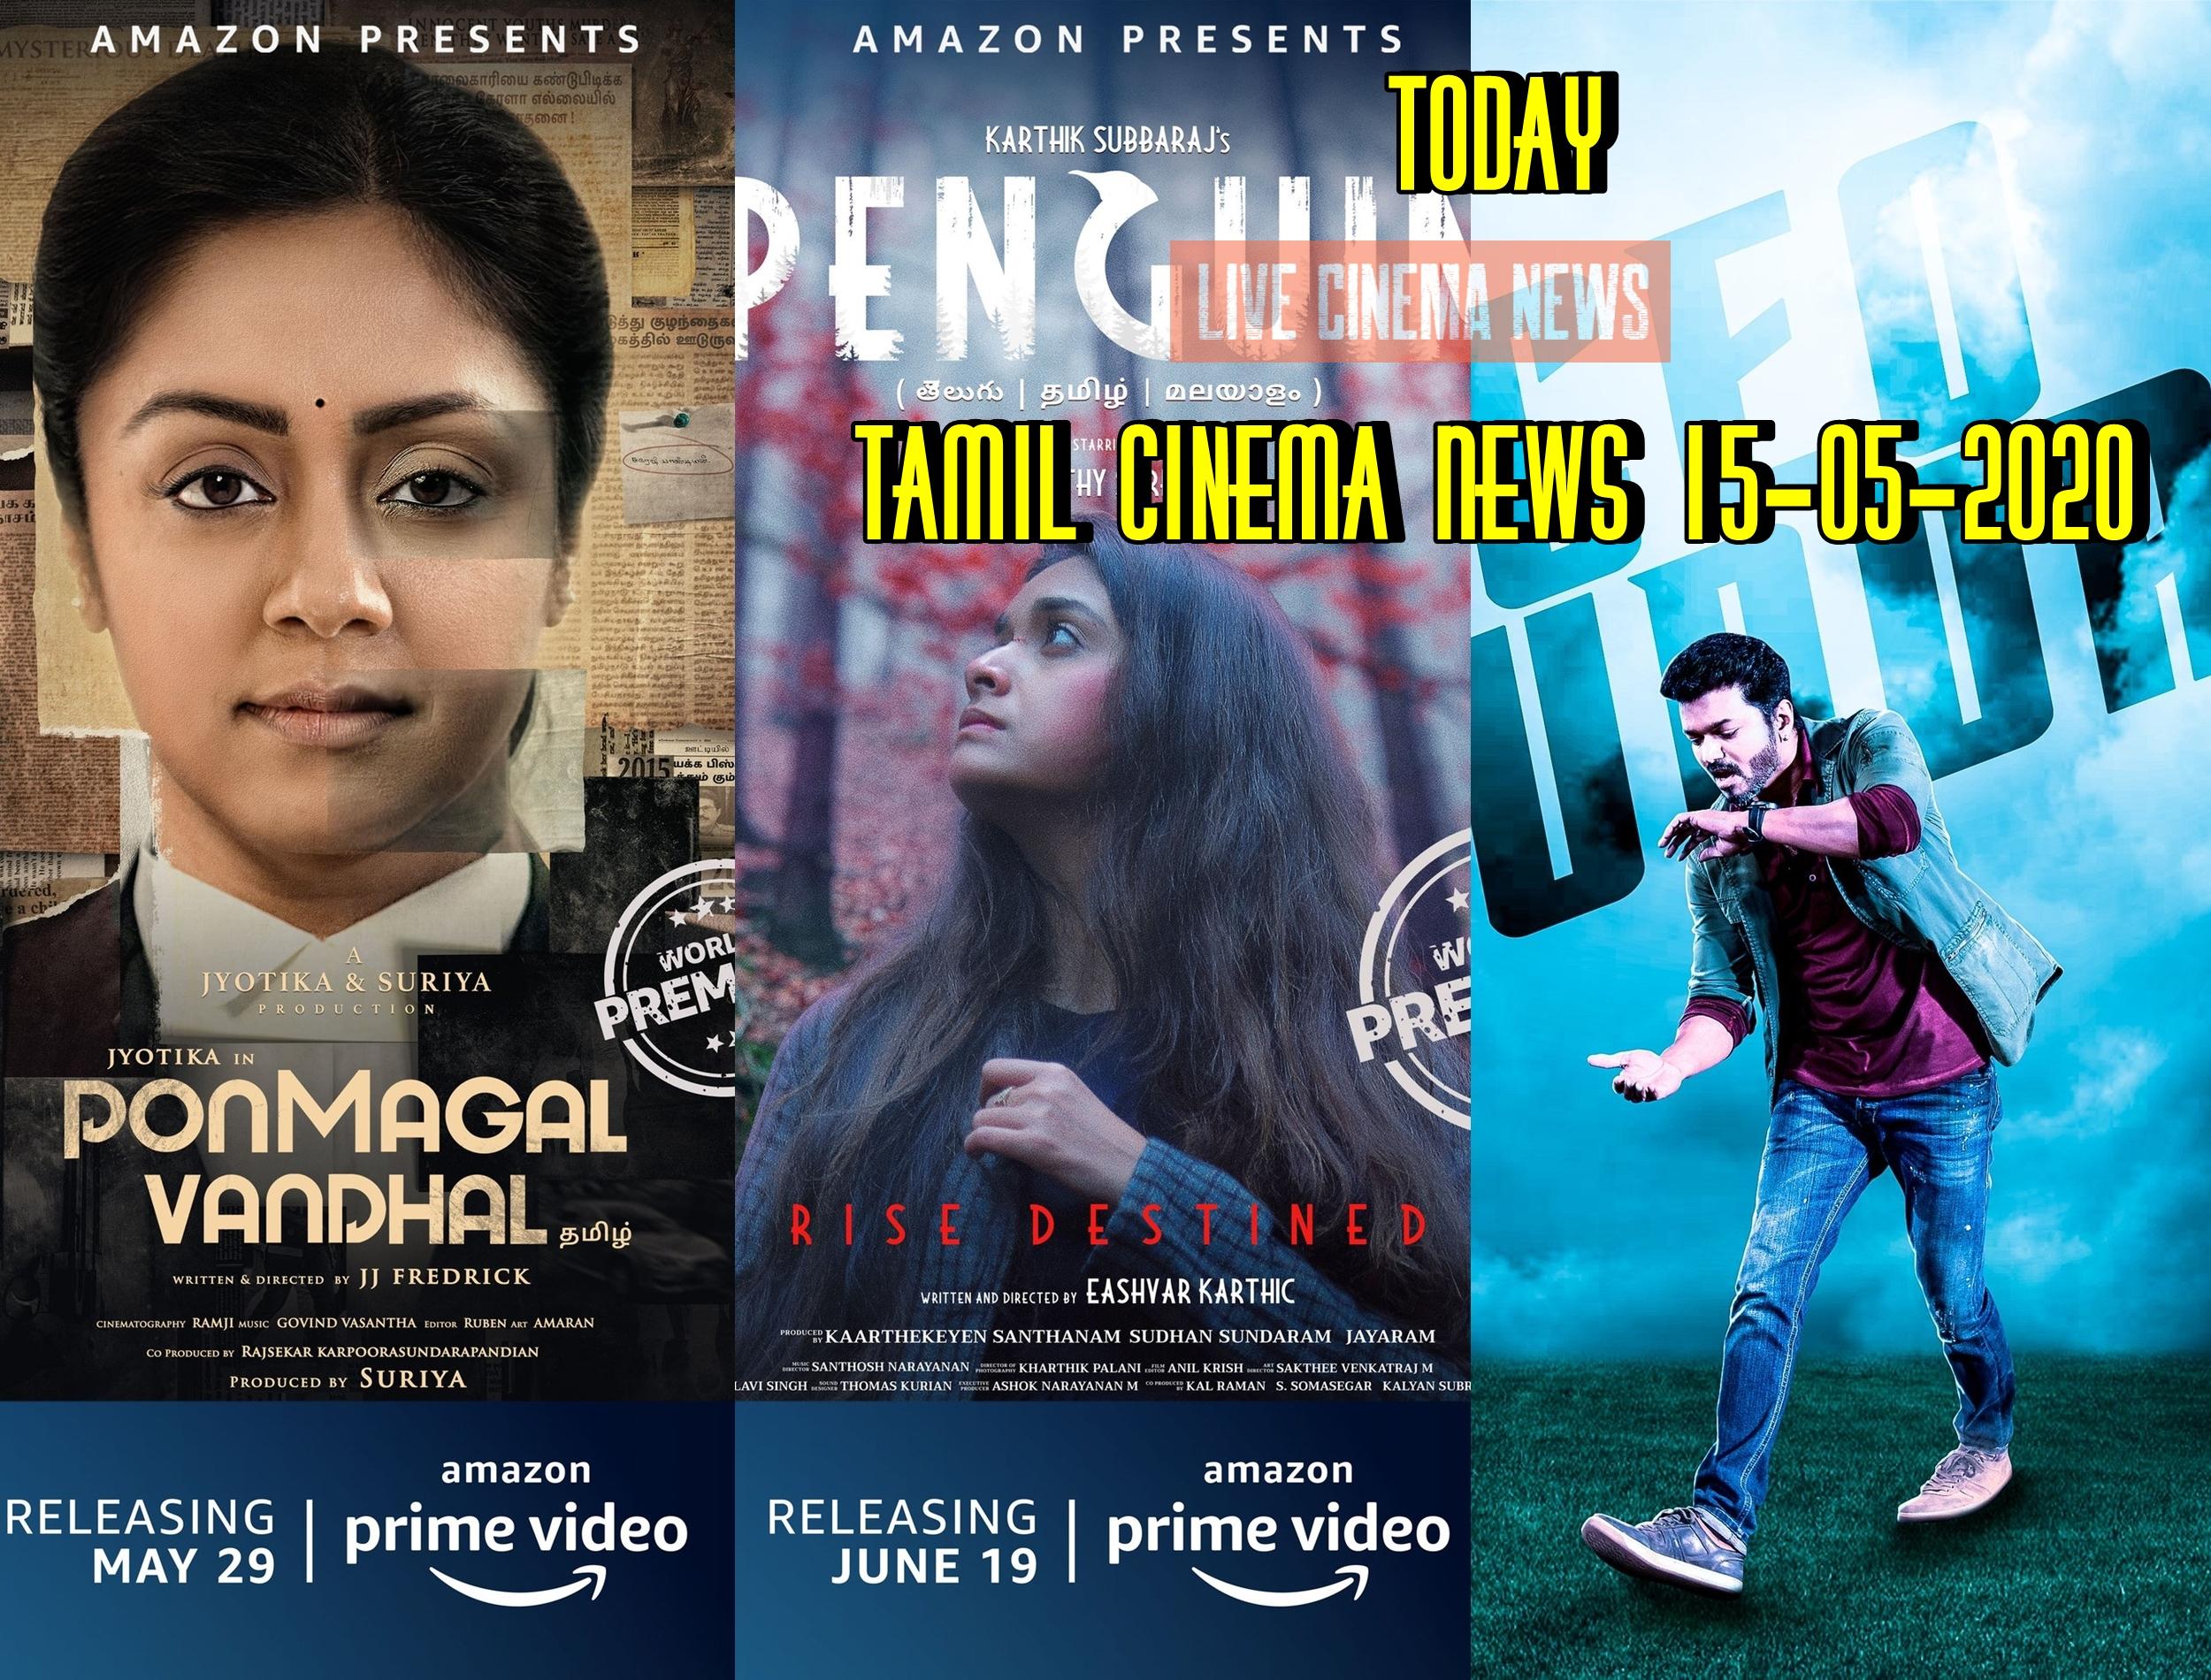 Today Tamil Cinema News 15-05-2020